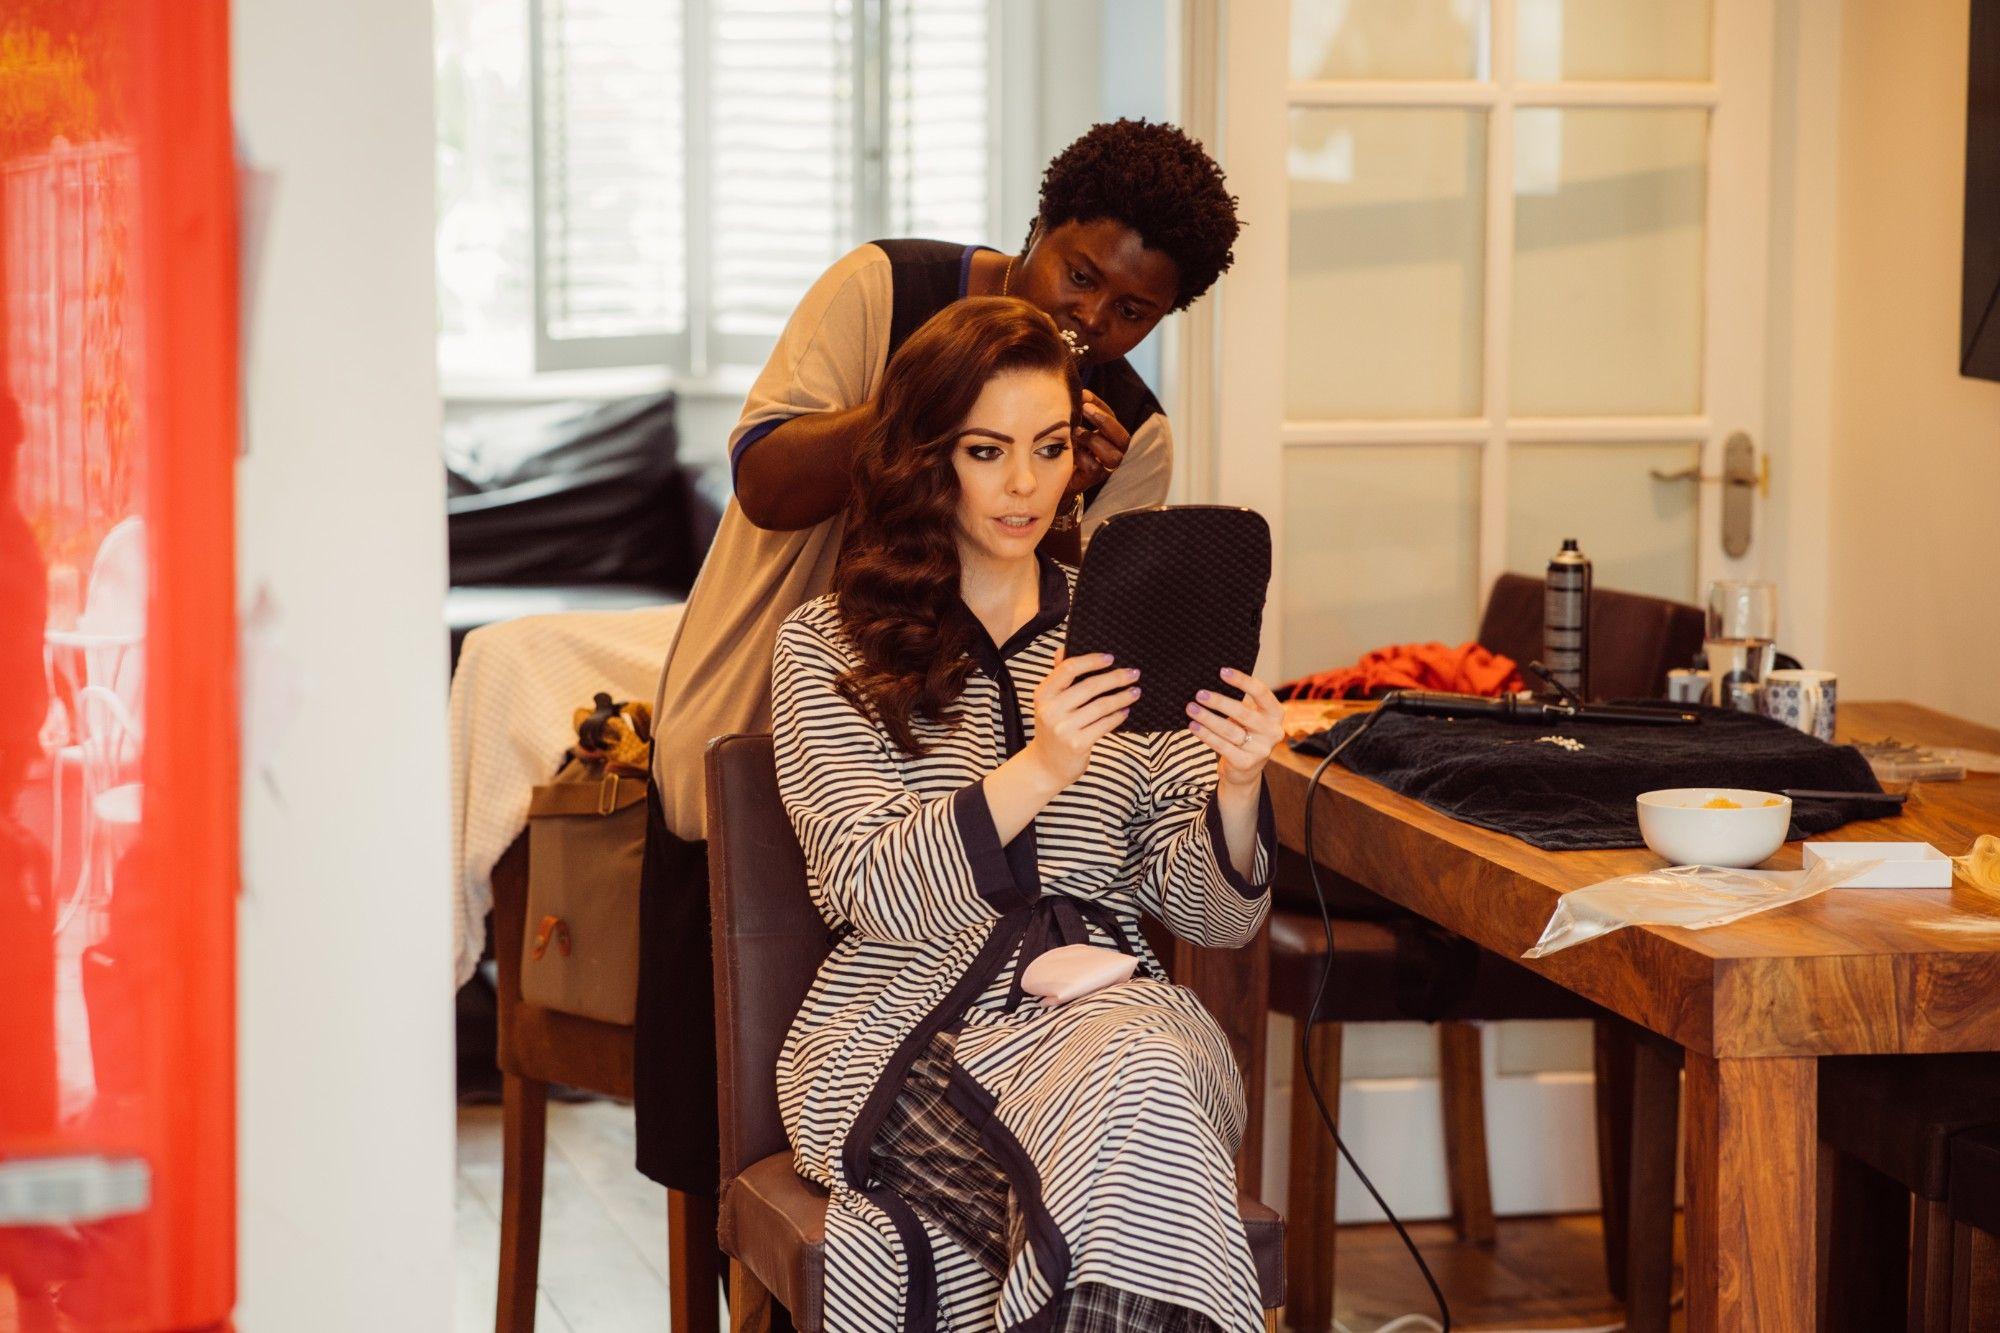 Bridal-wedding-hair-stylist-Tetbury-Gloucestershire-UK-LL-25